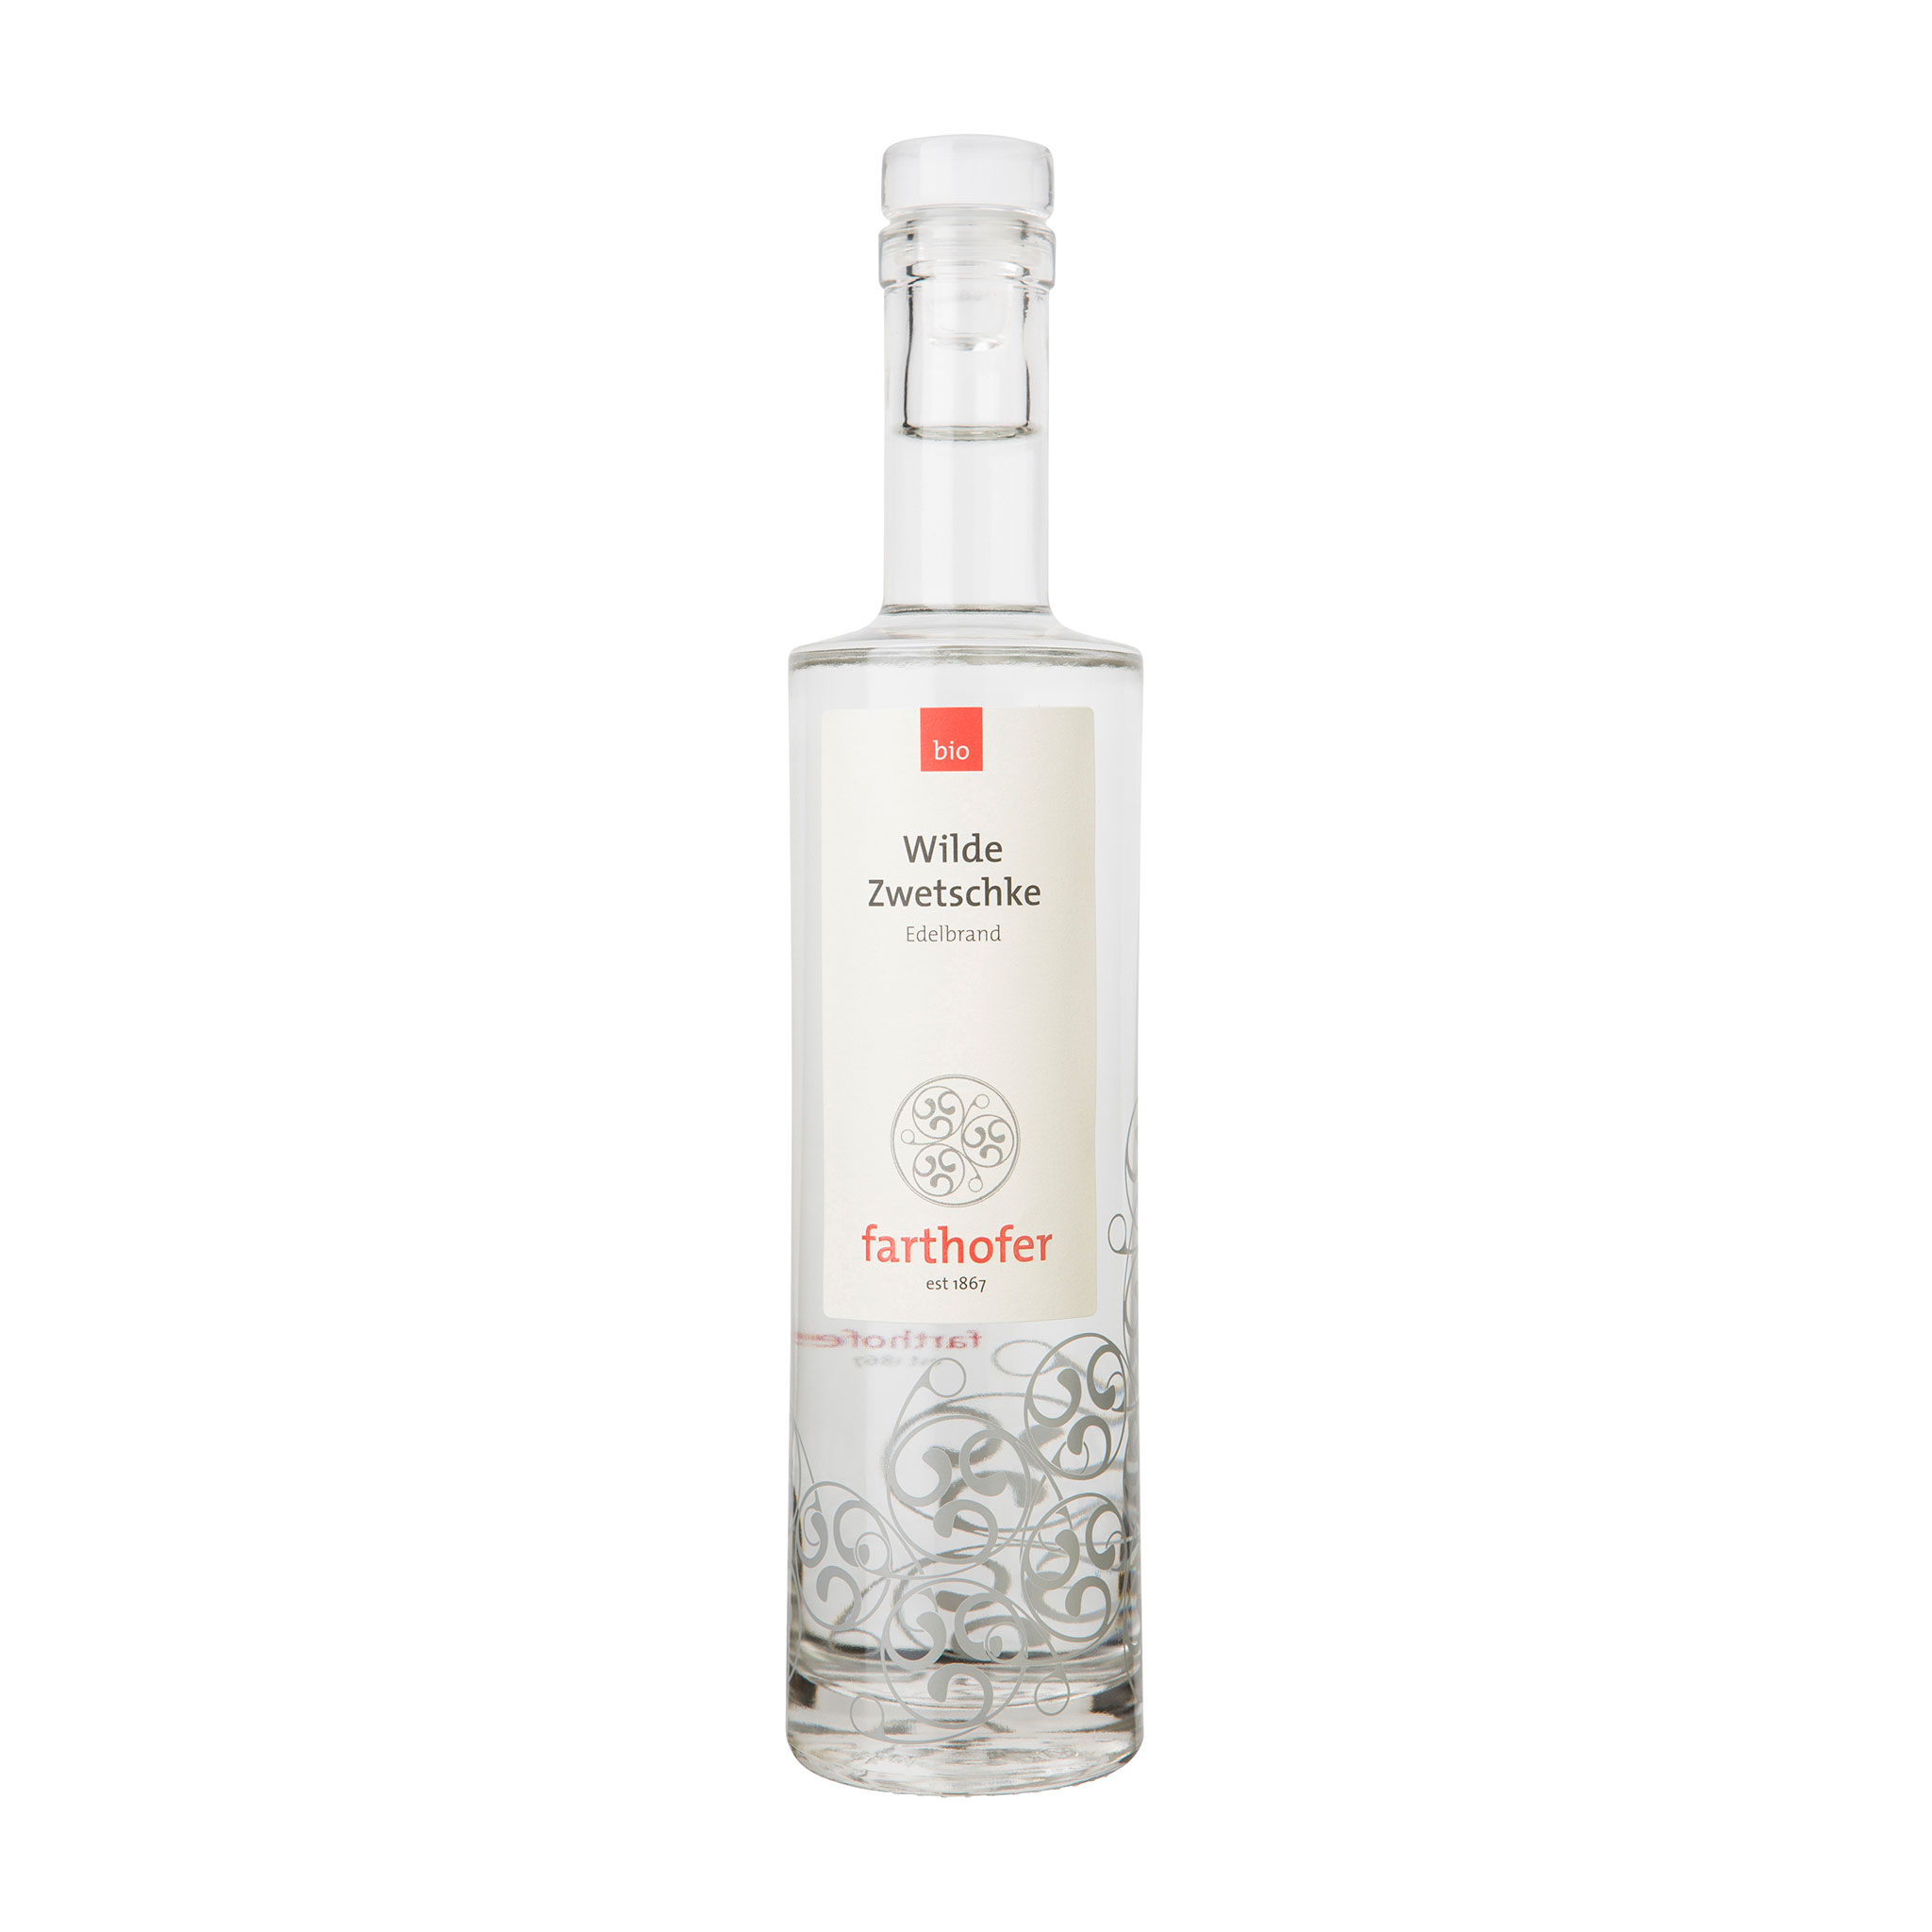 Wilde Zwetschke (700 ml)